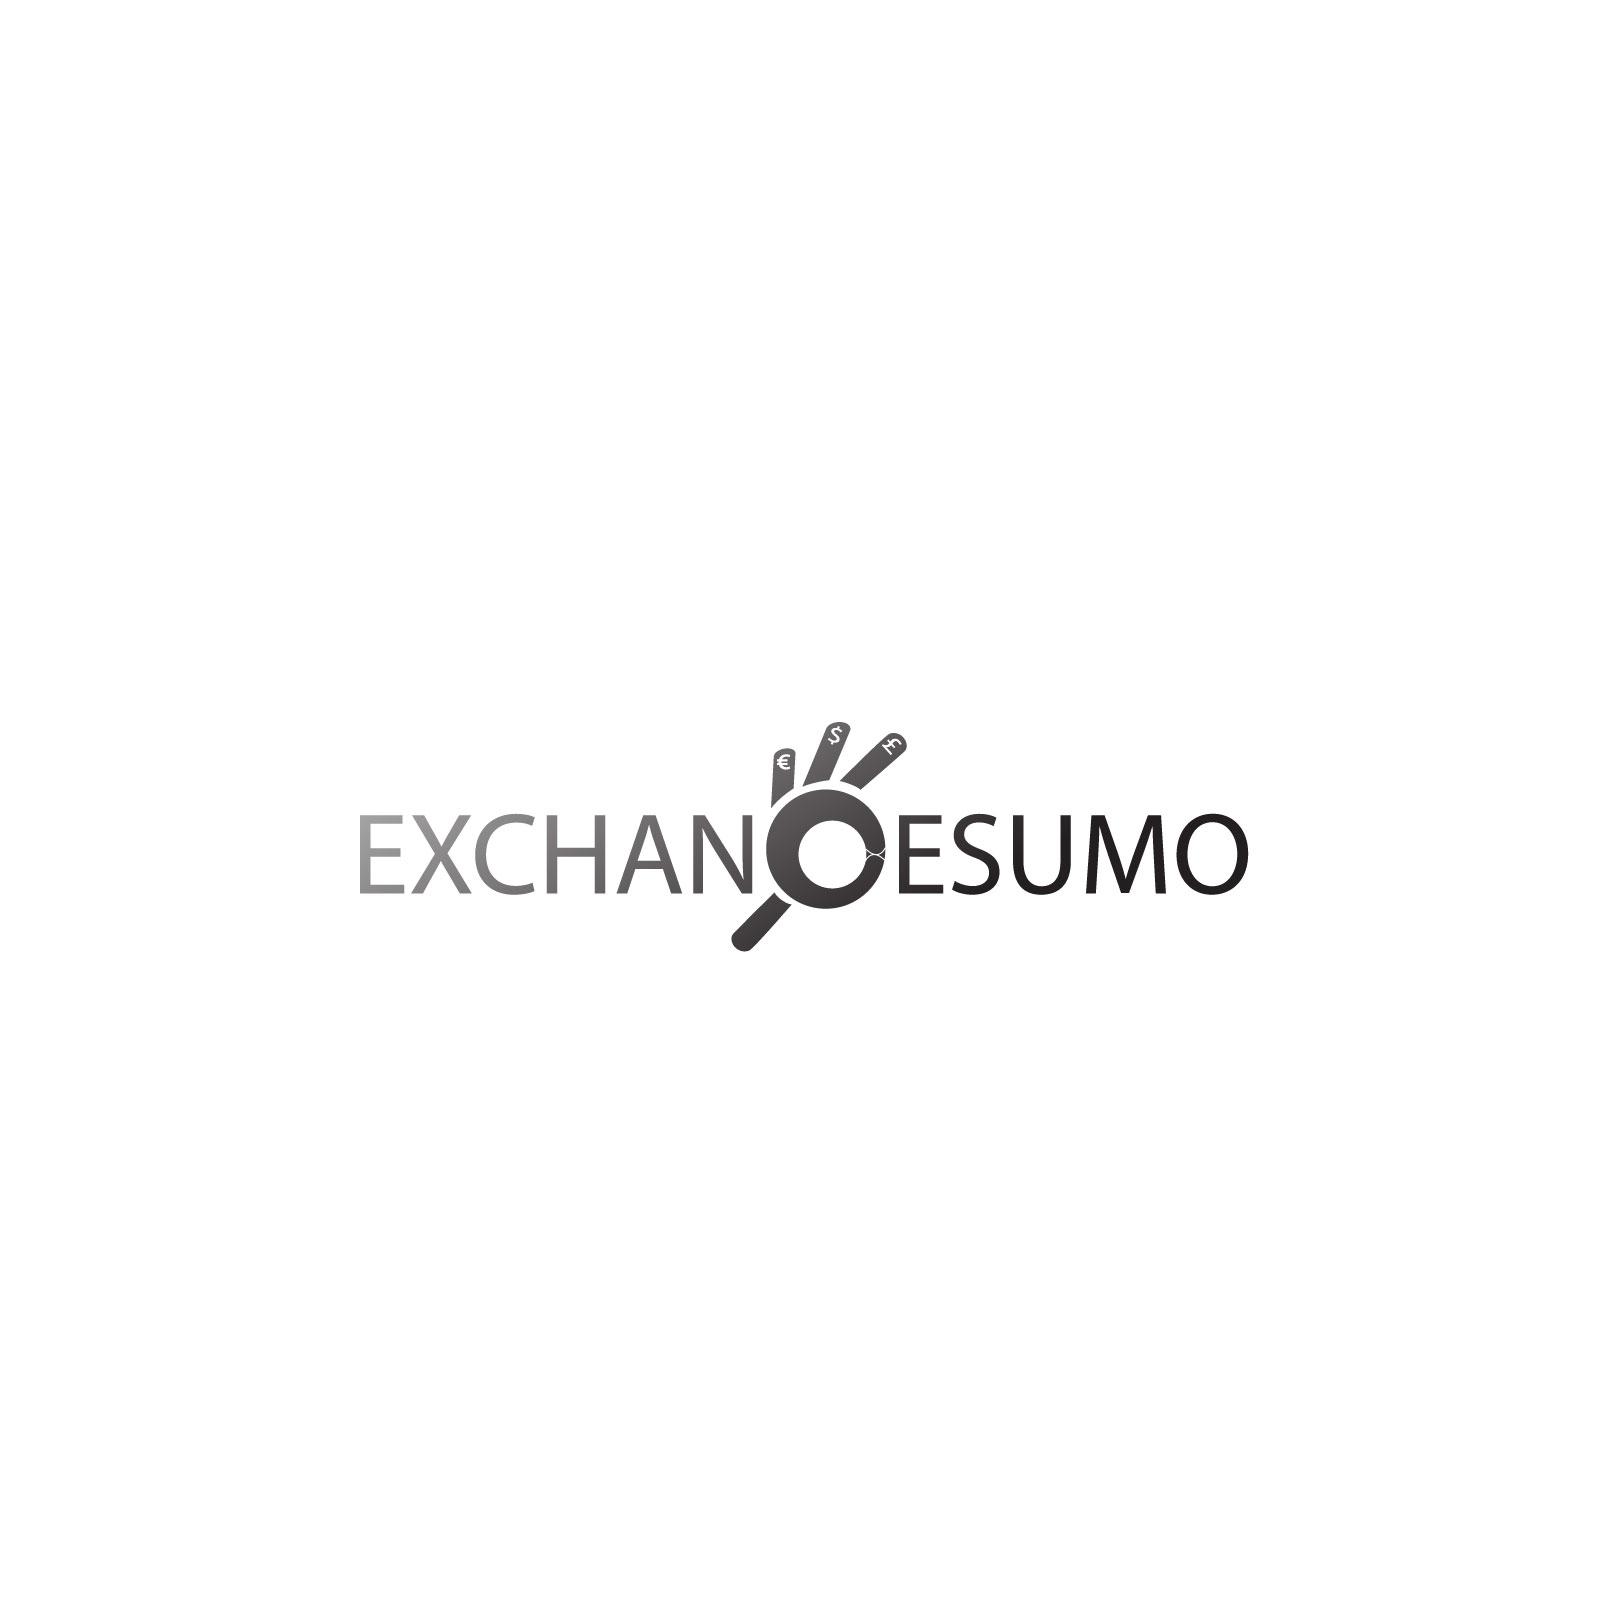 Логотип для мониторинга обменников фото f_8035baa818618474.jpg